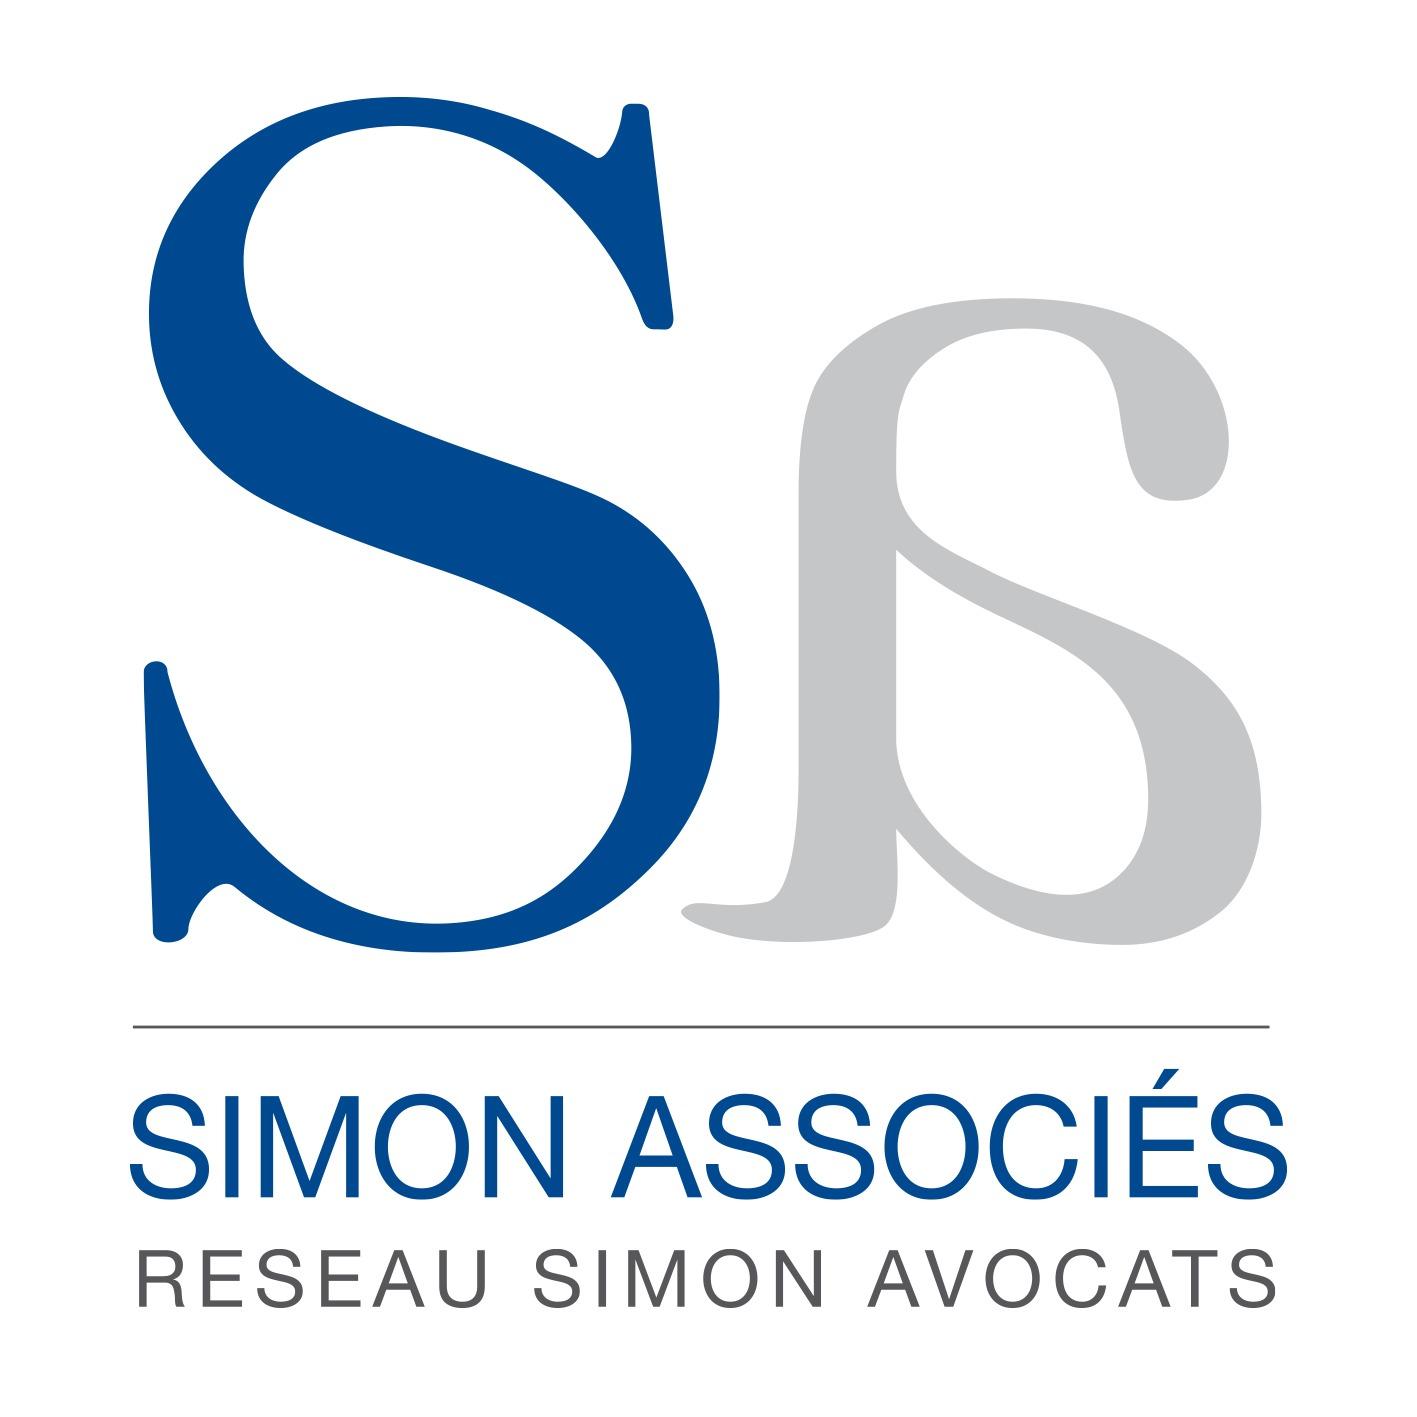 the Simon & Associés logo.